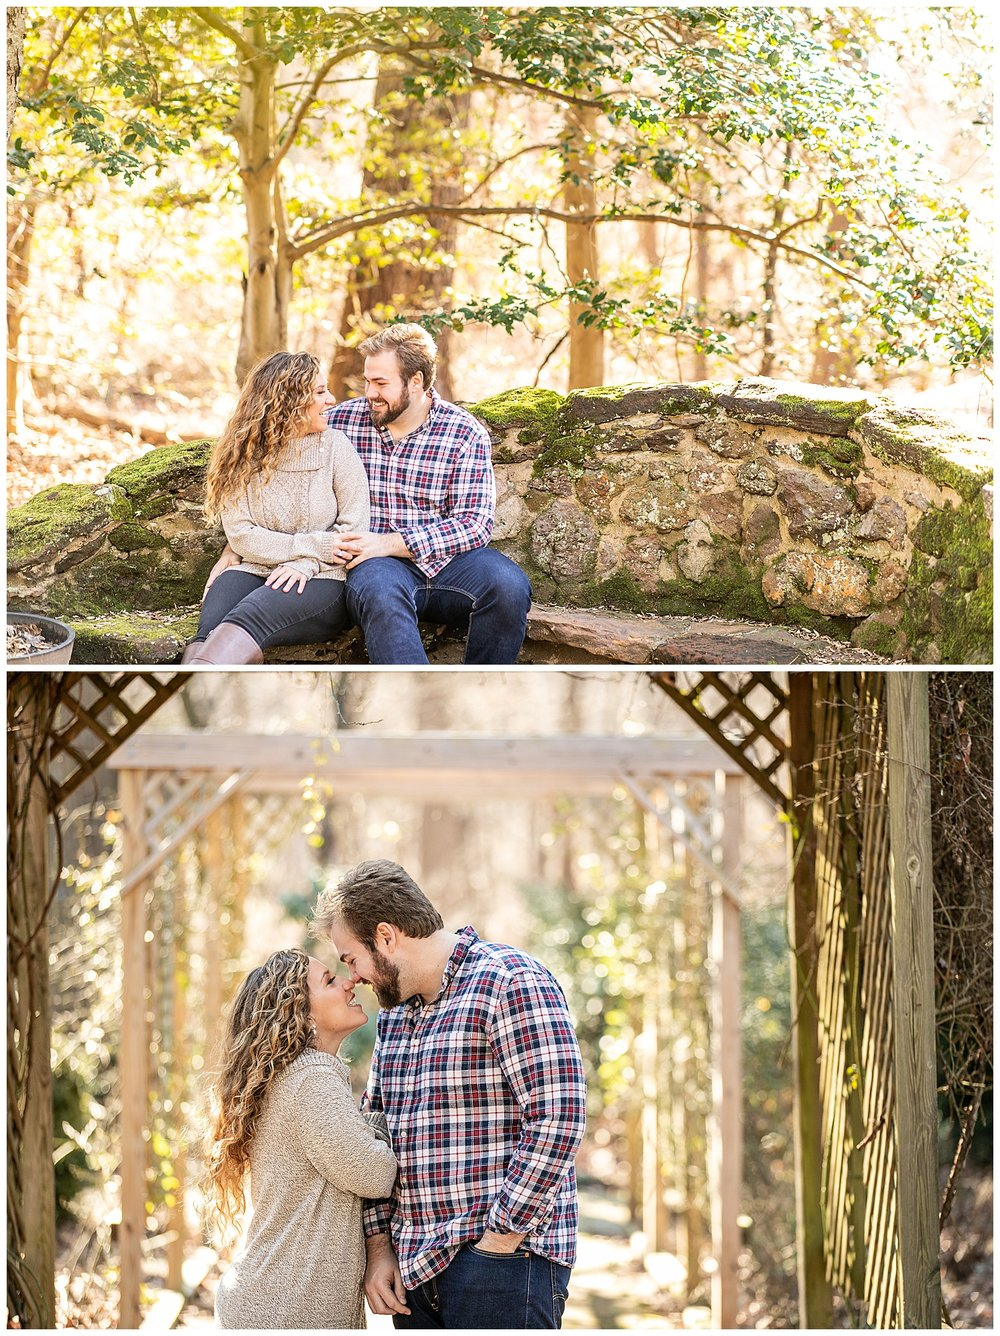 Alyssa Sammy Smallwood Downs Park Engagement Session Living Radiant Photography photos_0009.jpg